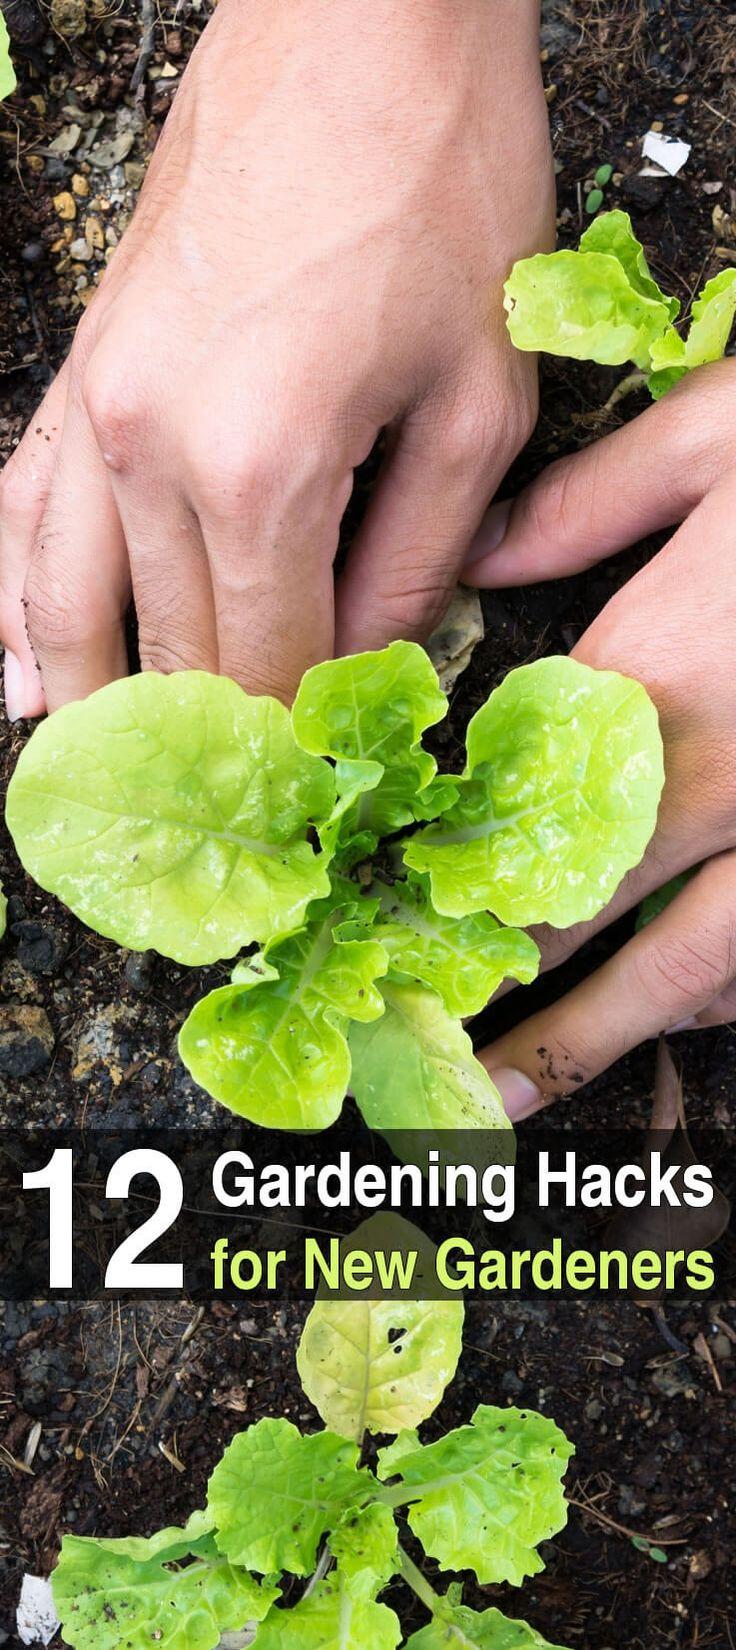 best 25 gardening hacks ideas on pinterest organic gardening tips growing vegetables and